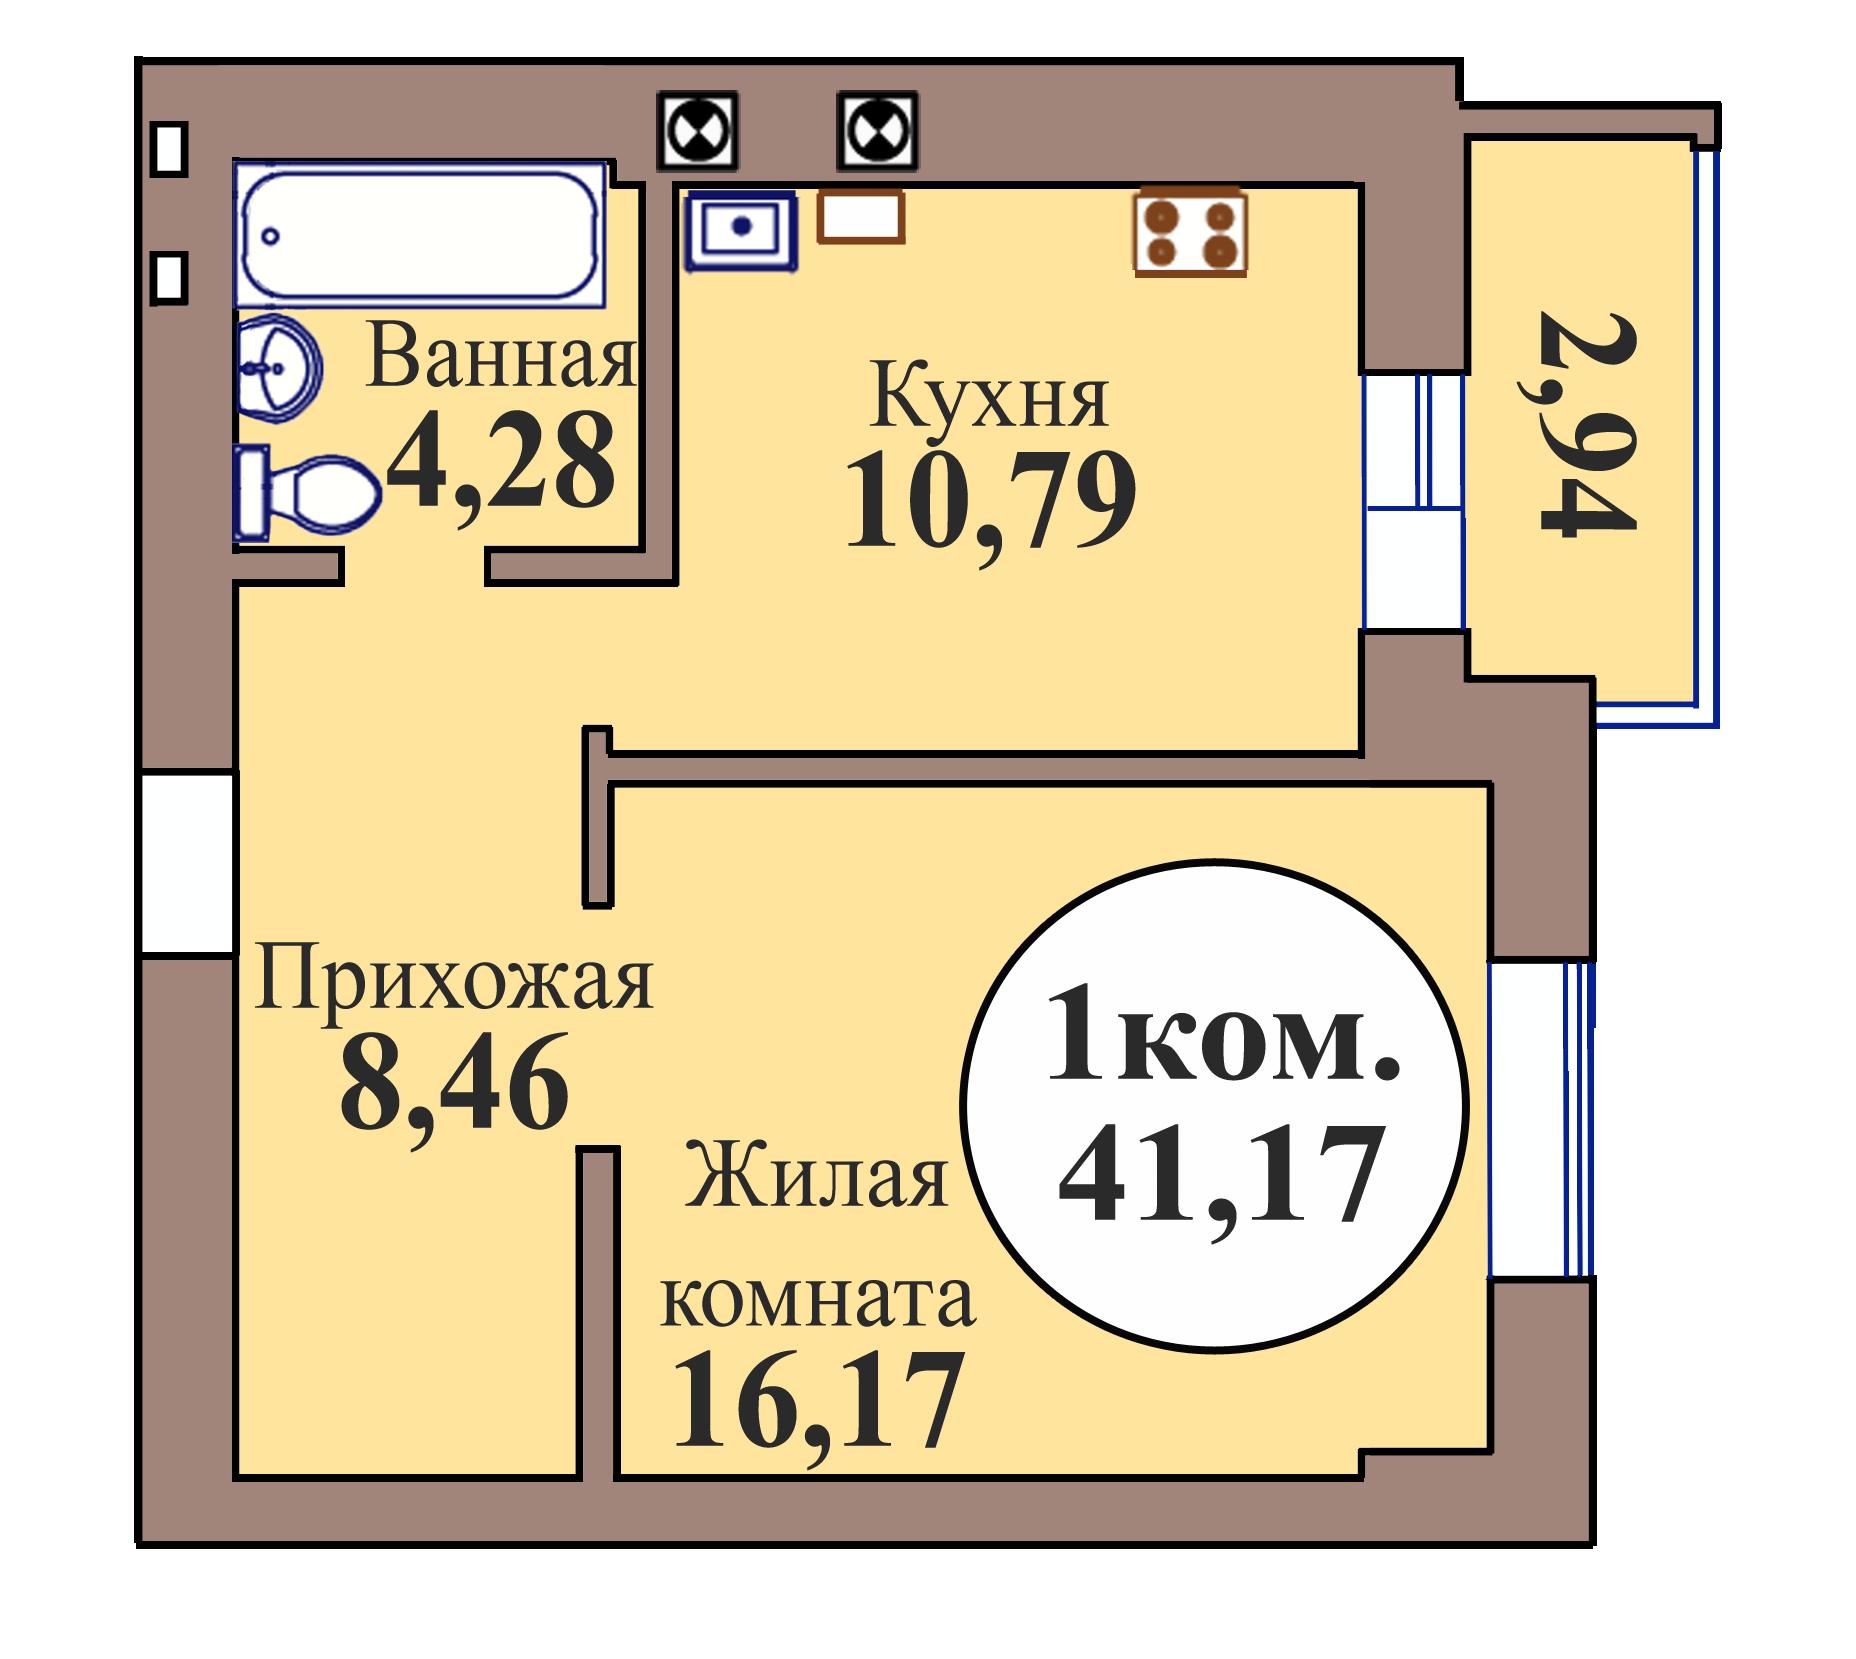 1-комн. кв. по пер. Калининградский, 5 кв. 106 в Калининграде